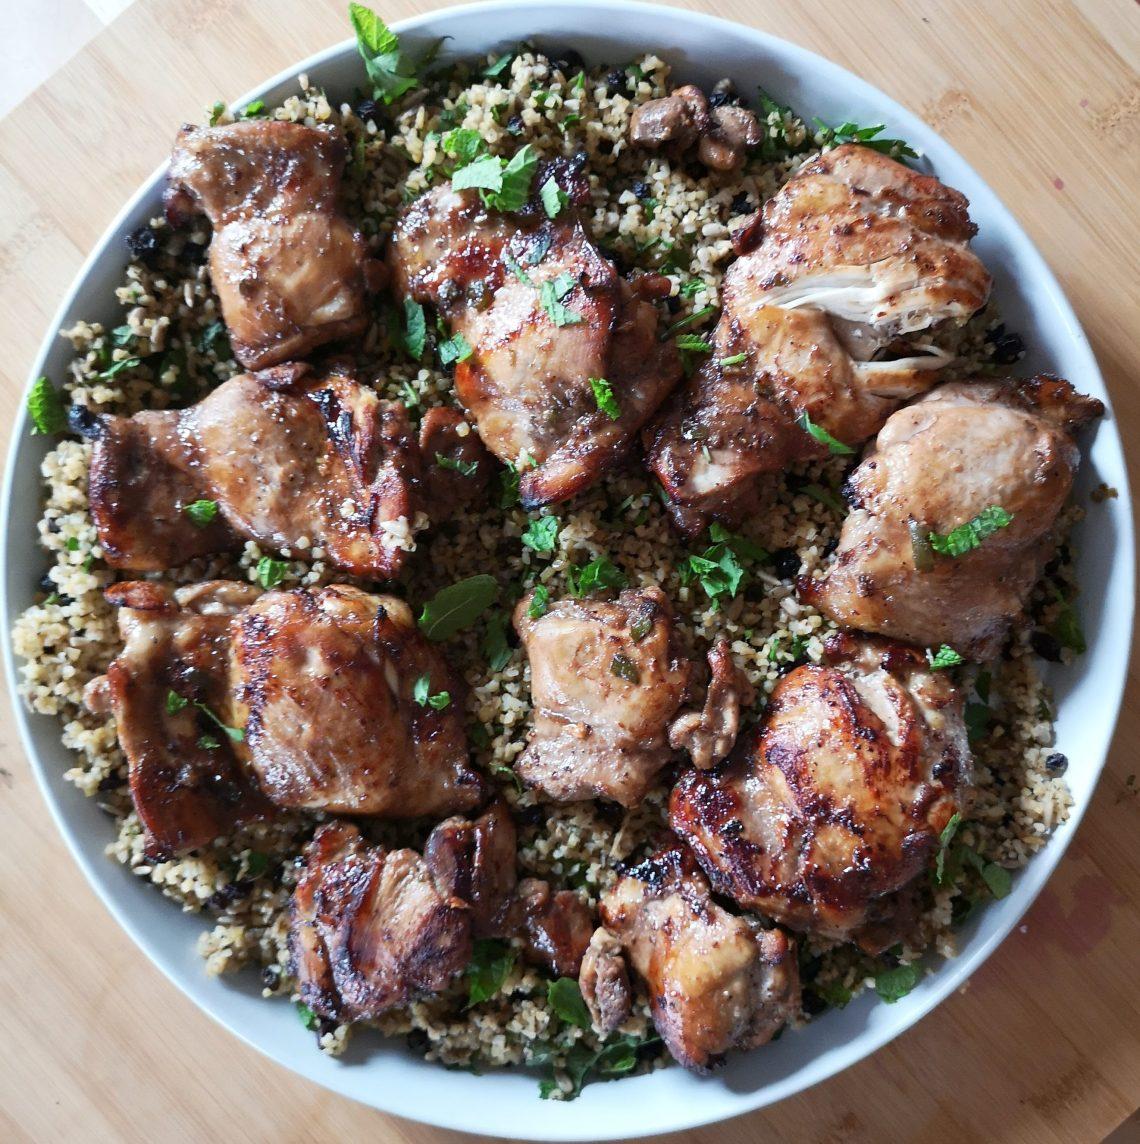 Pomegranate molasses chicken with bulgar wheat salad Honey & Co